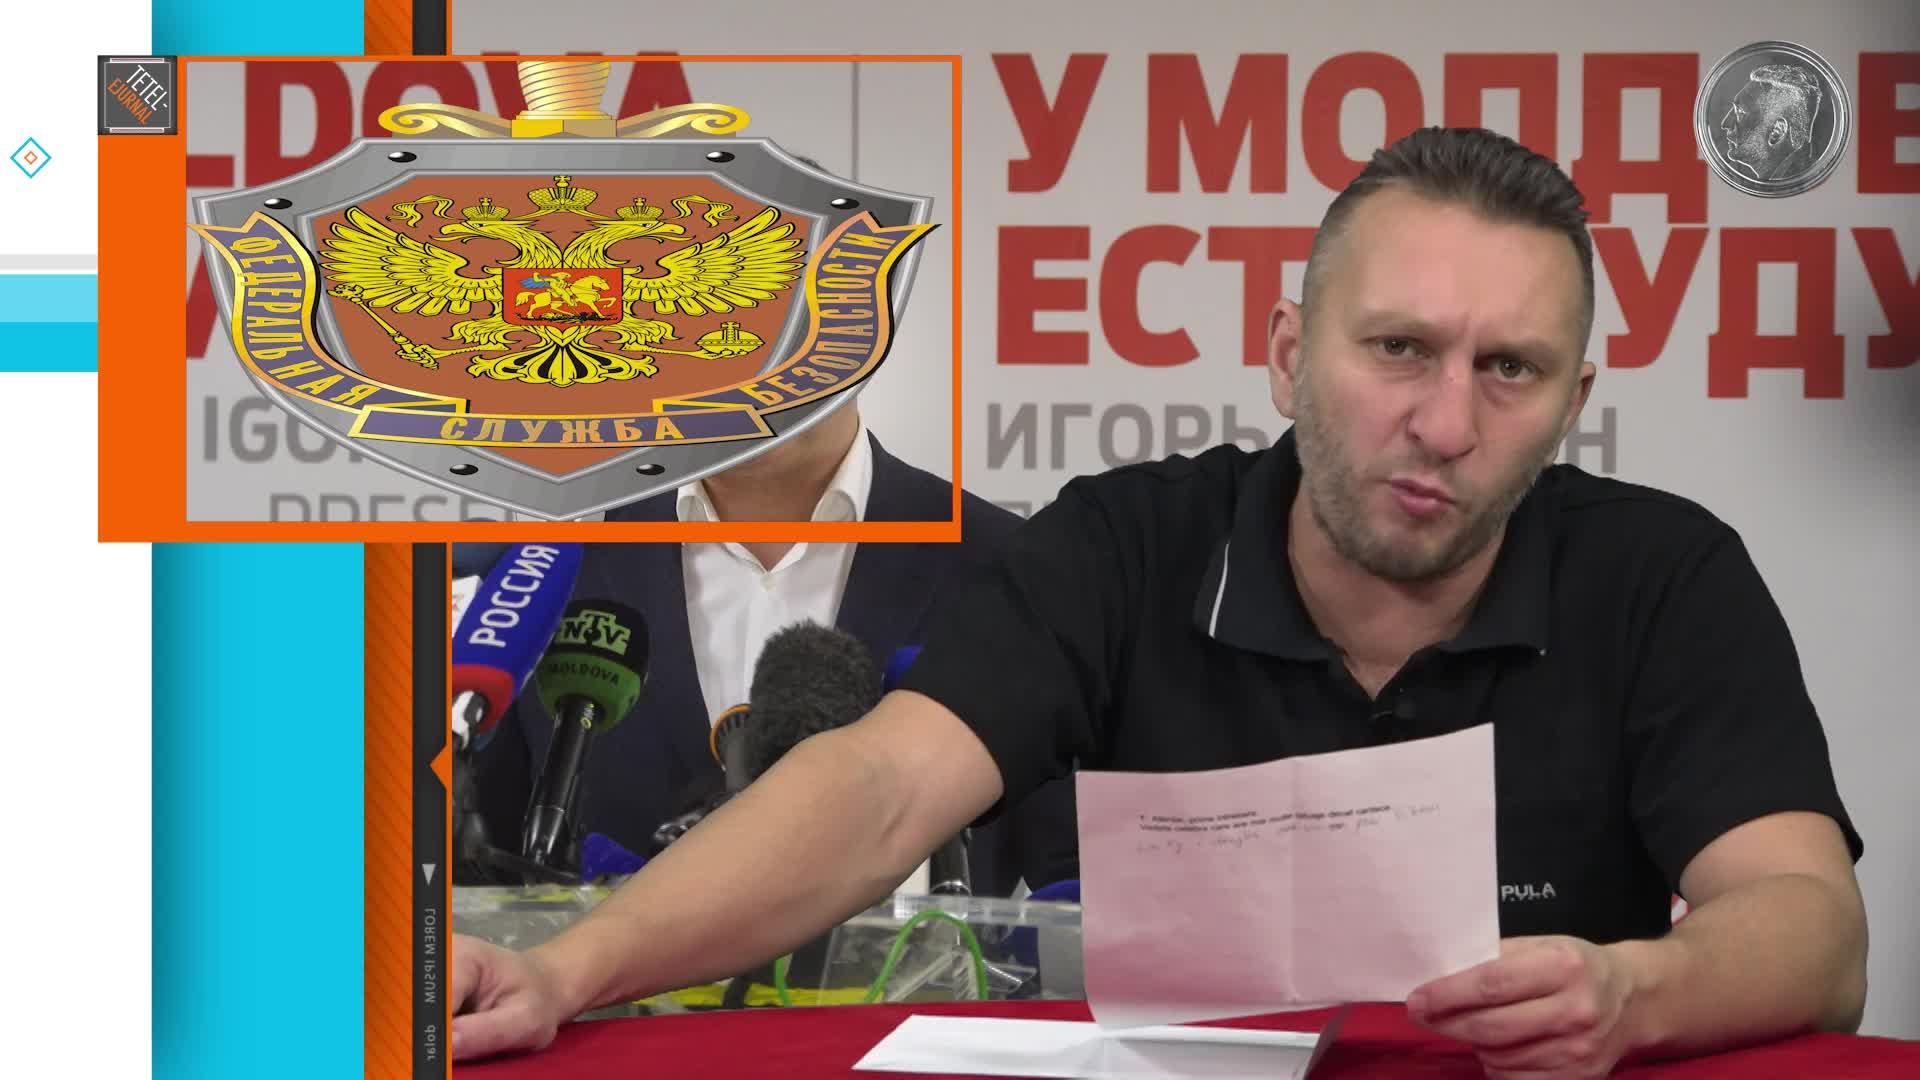 Alegerile din Moldova la Tetelejurnal